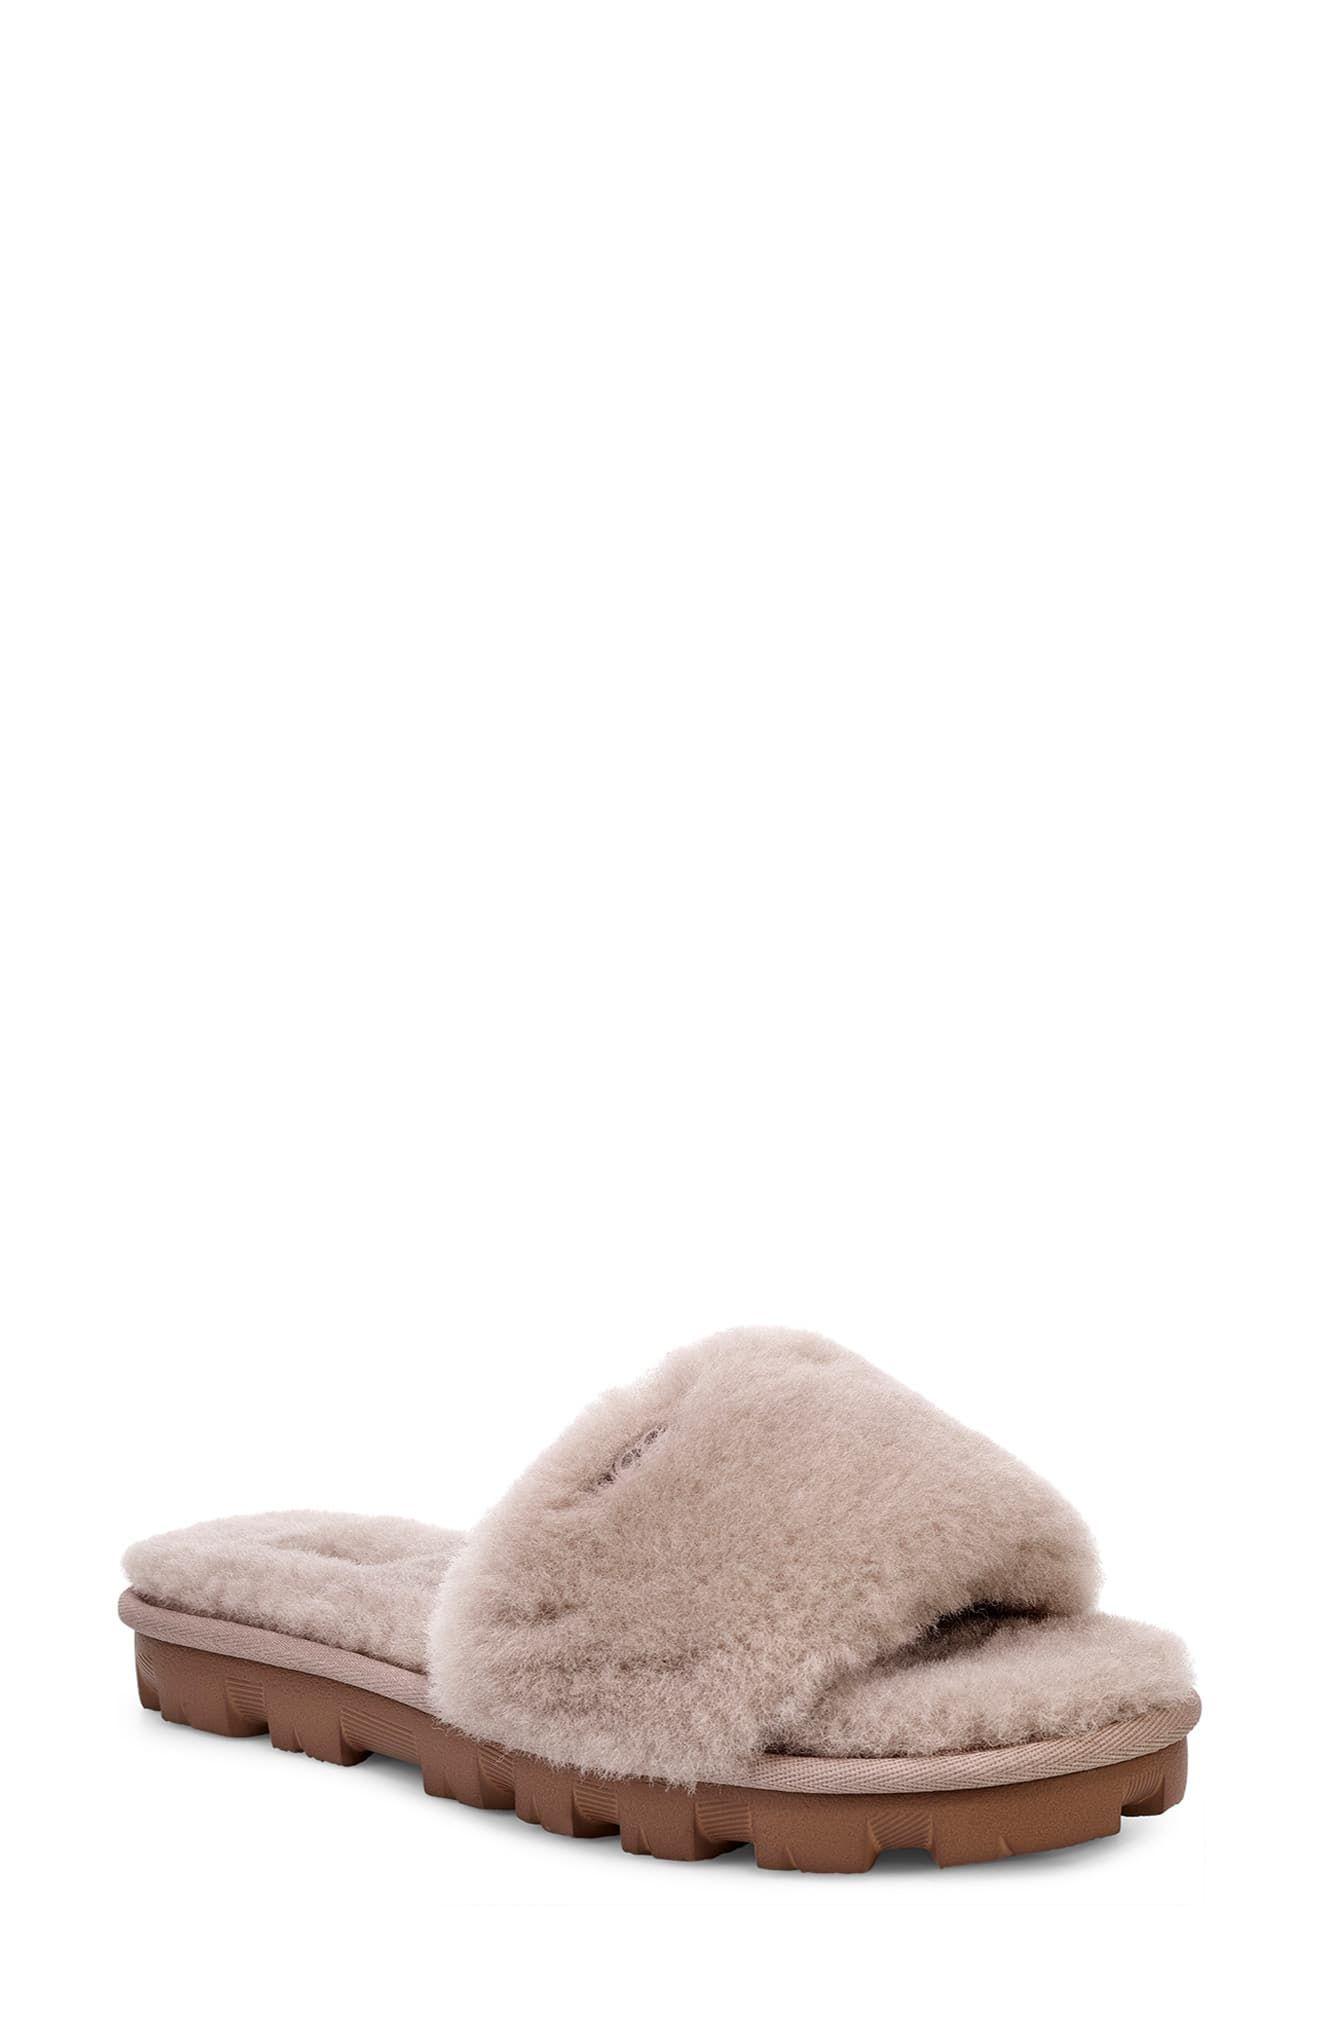 UGG Cozette Genuine Shearling Slide